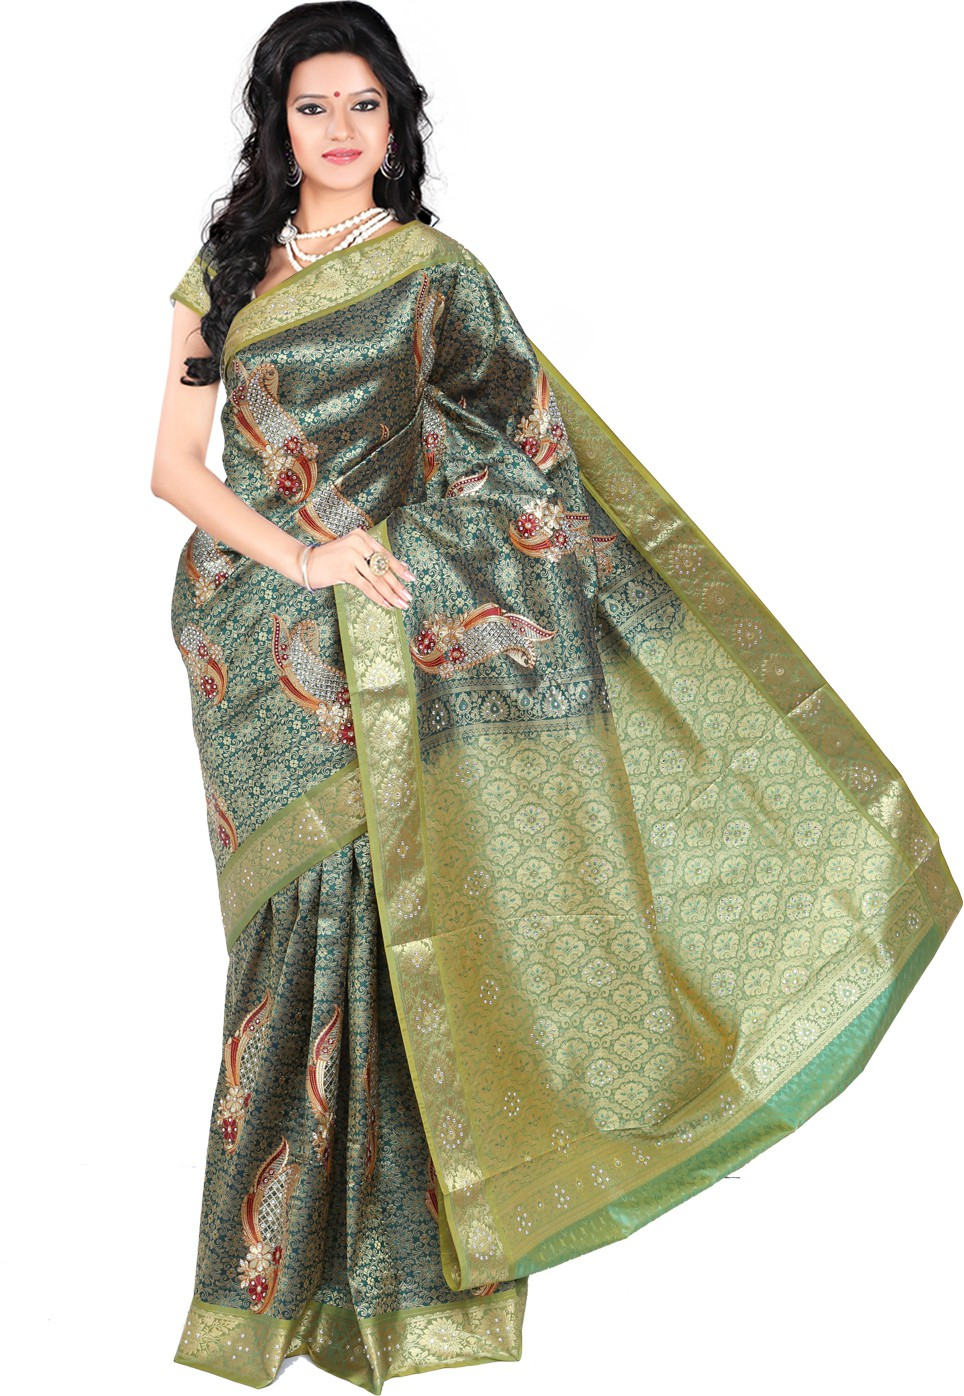 Roopkala Silks Embellished Dharmavaram Brocade Saree(Dark Green)